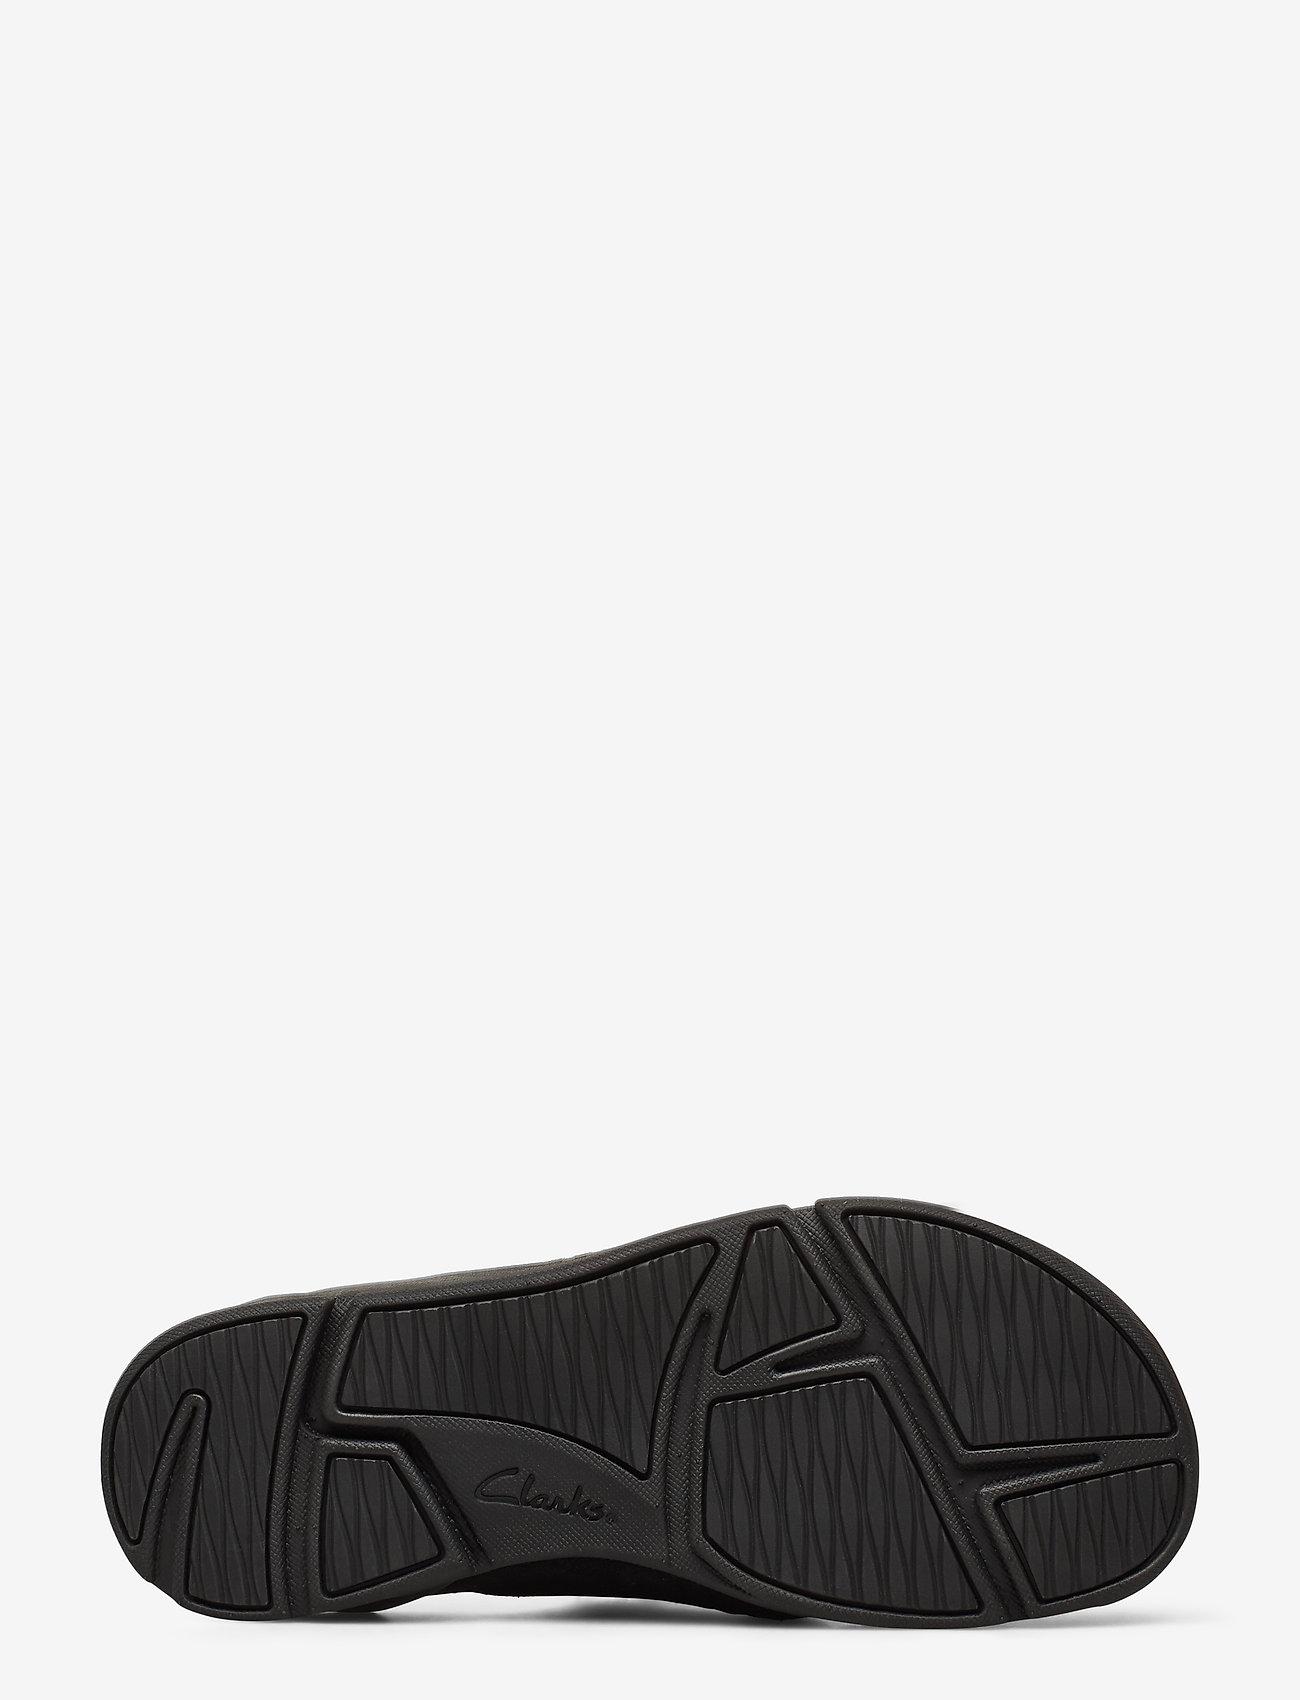 Tri Toe Post (Black Leather) - Clarks